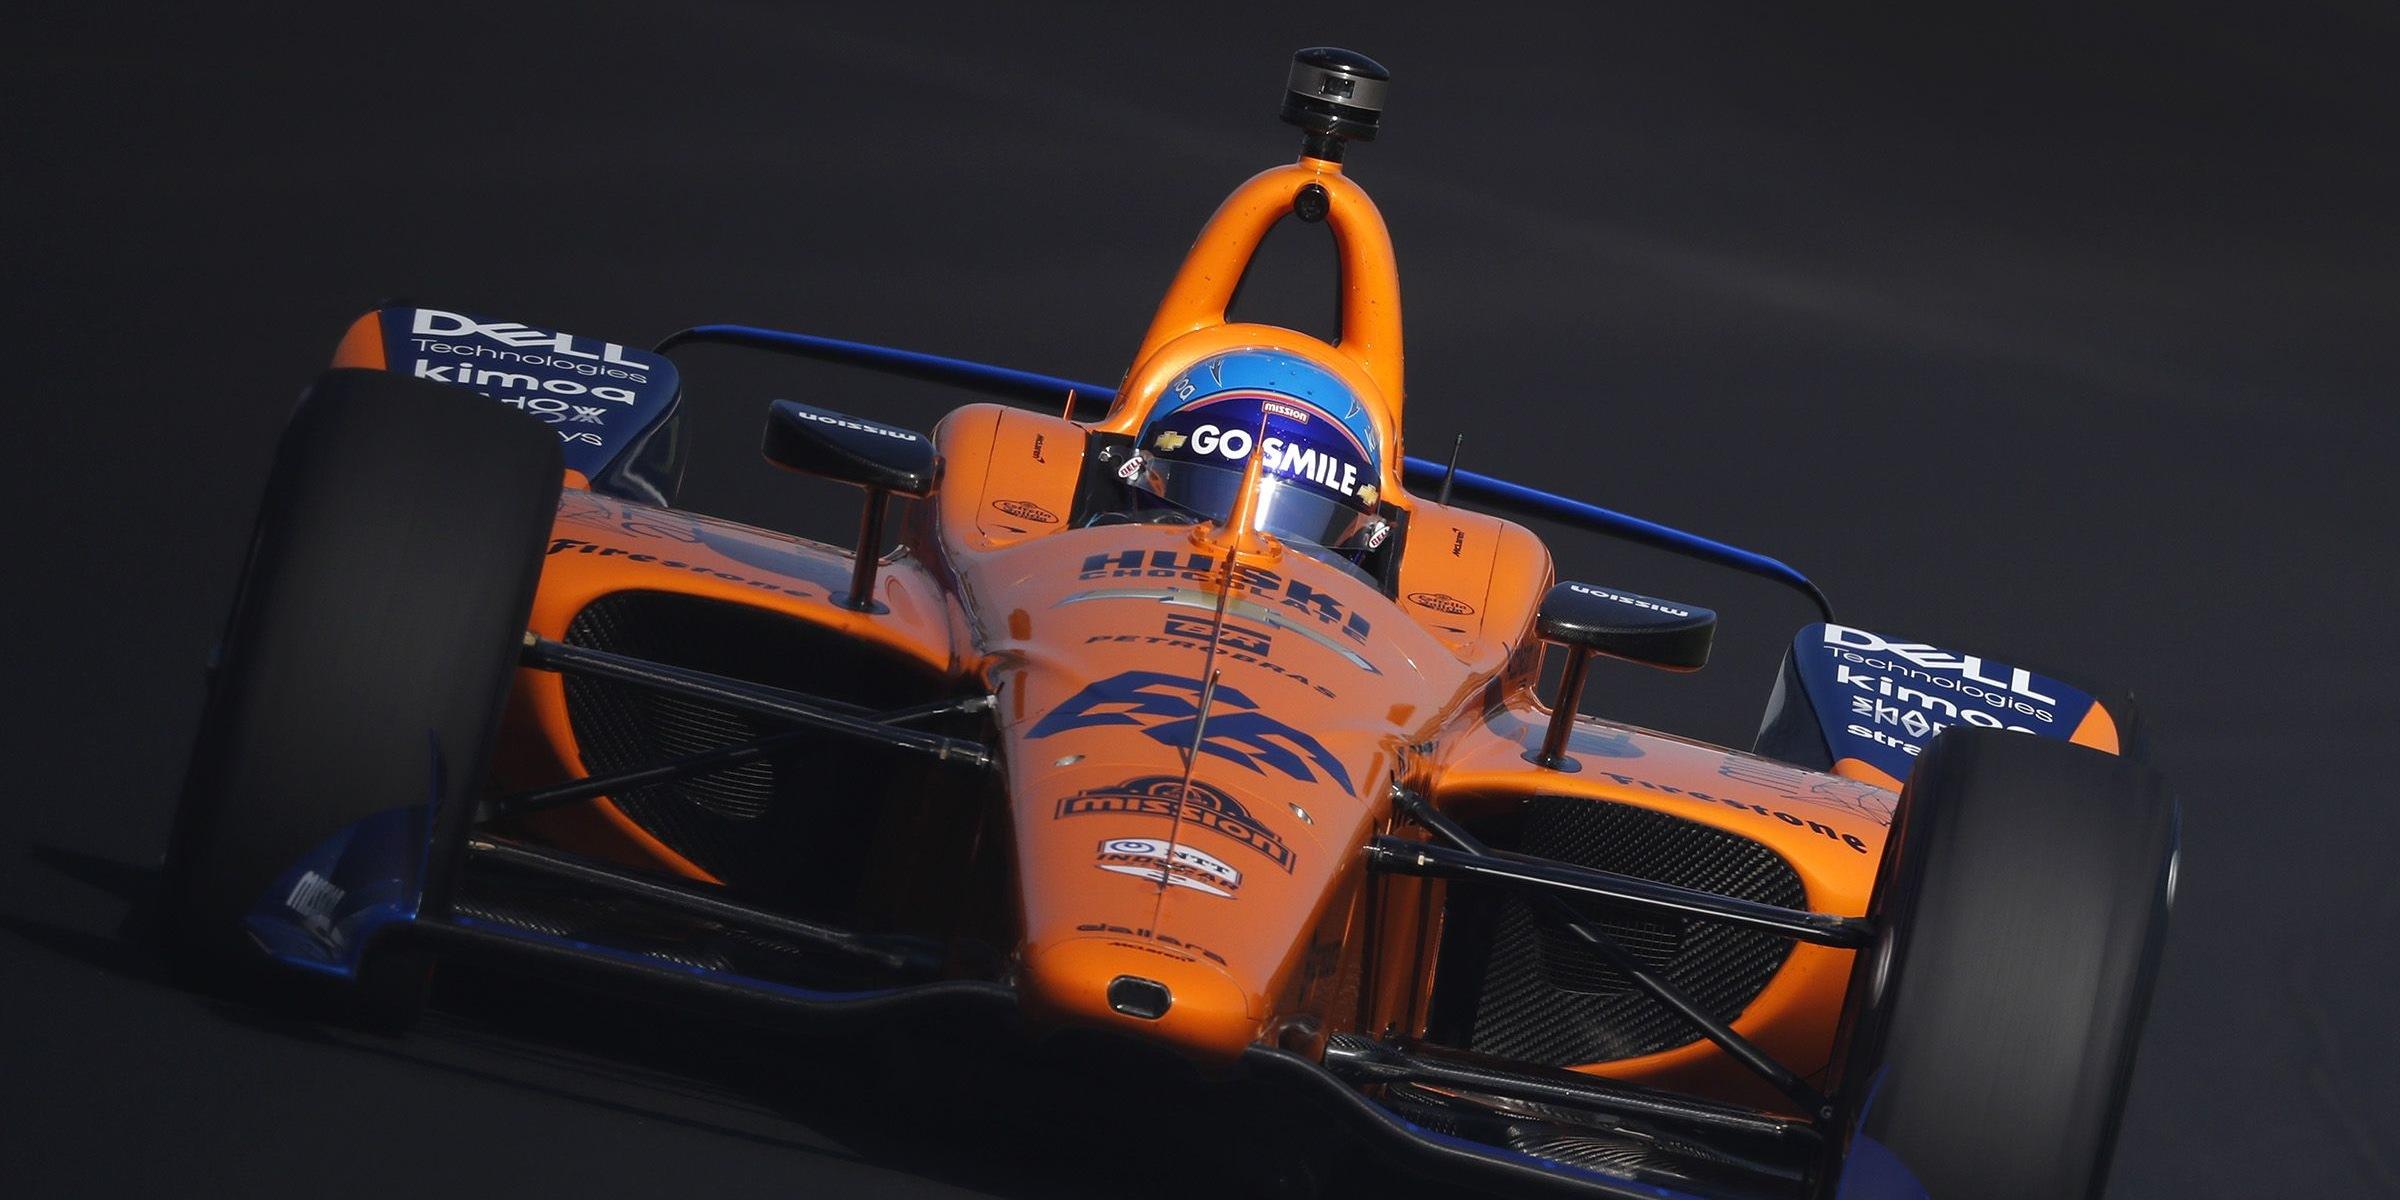 McLaren Race